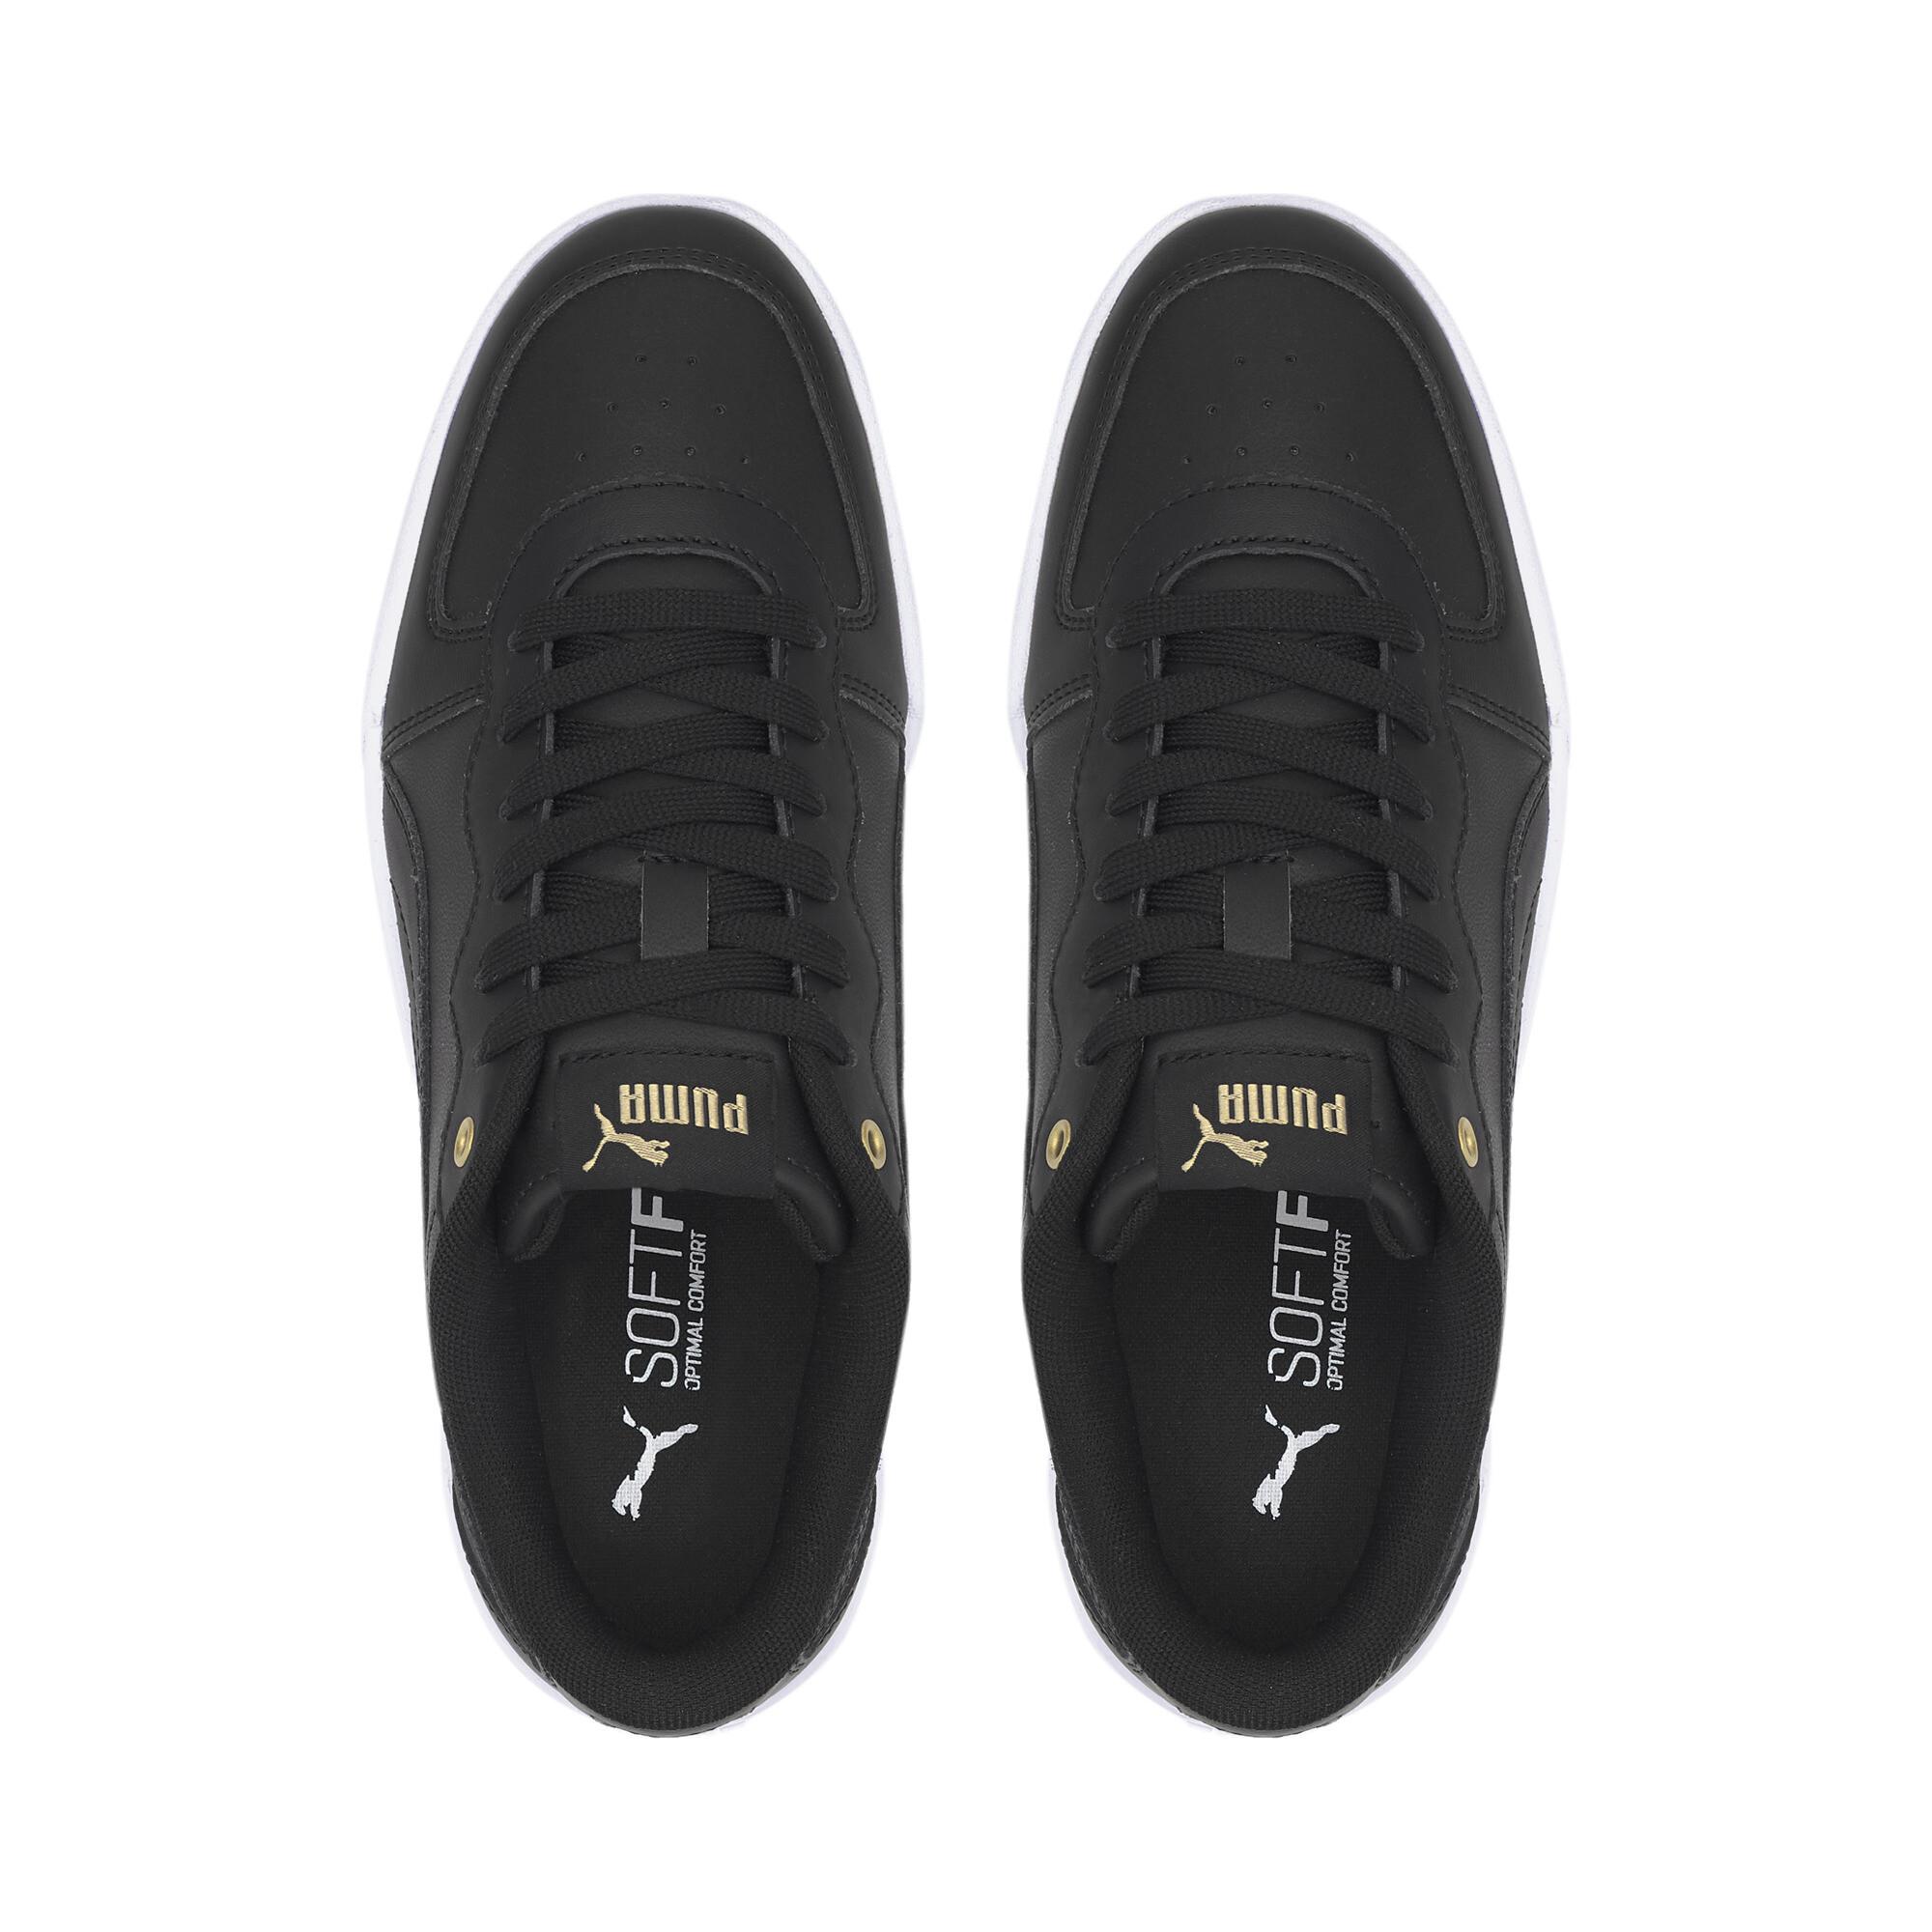 PUMA-Women-039-s-Skye-Sneakers thumbnail 13